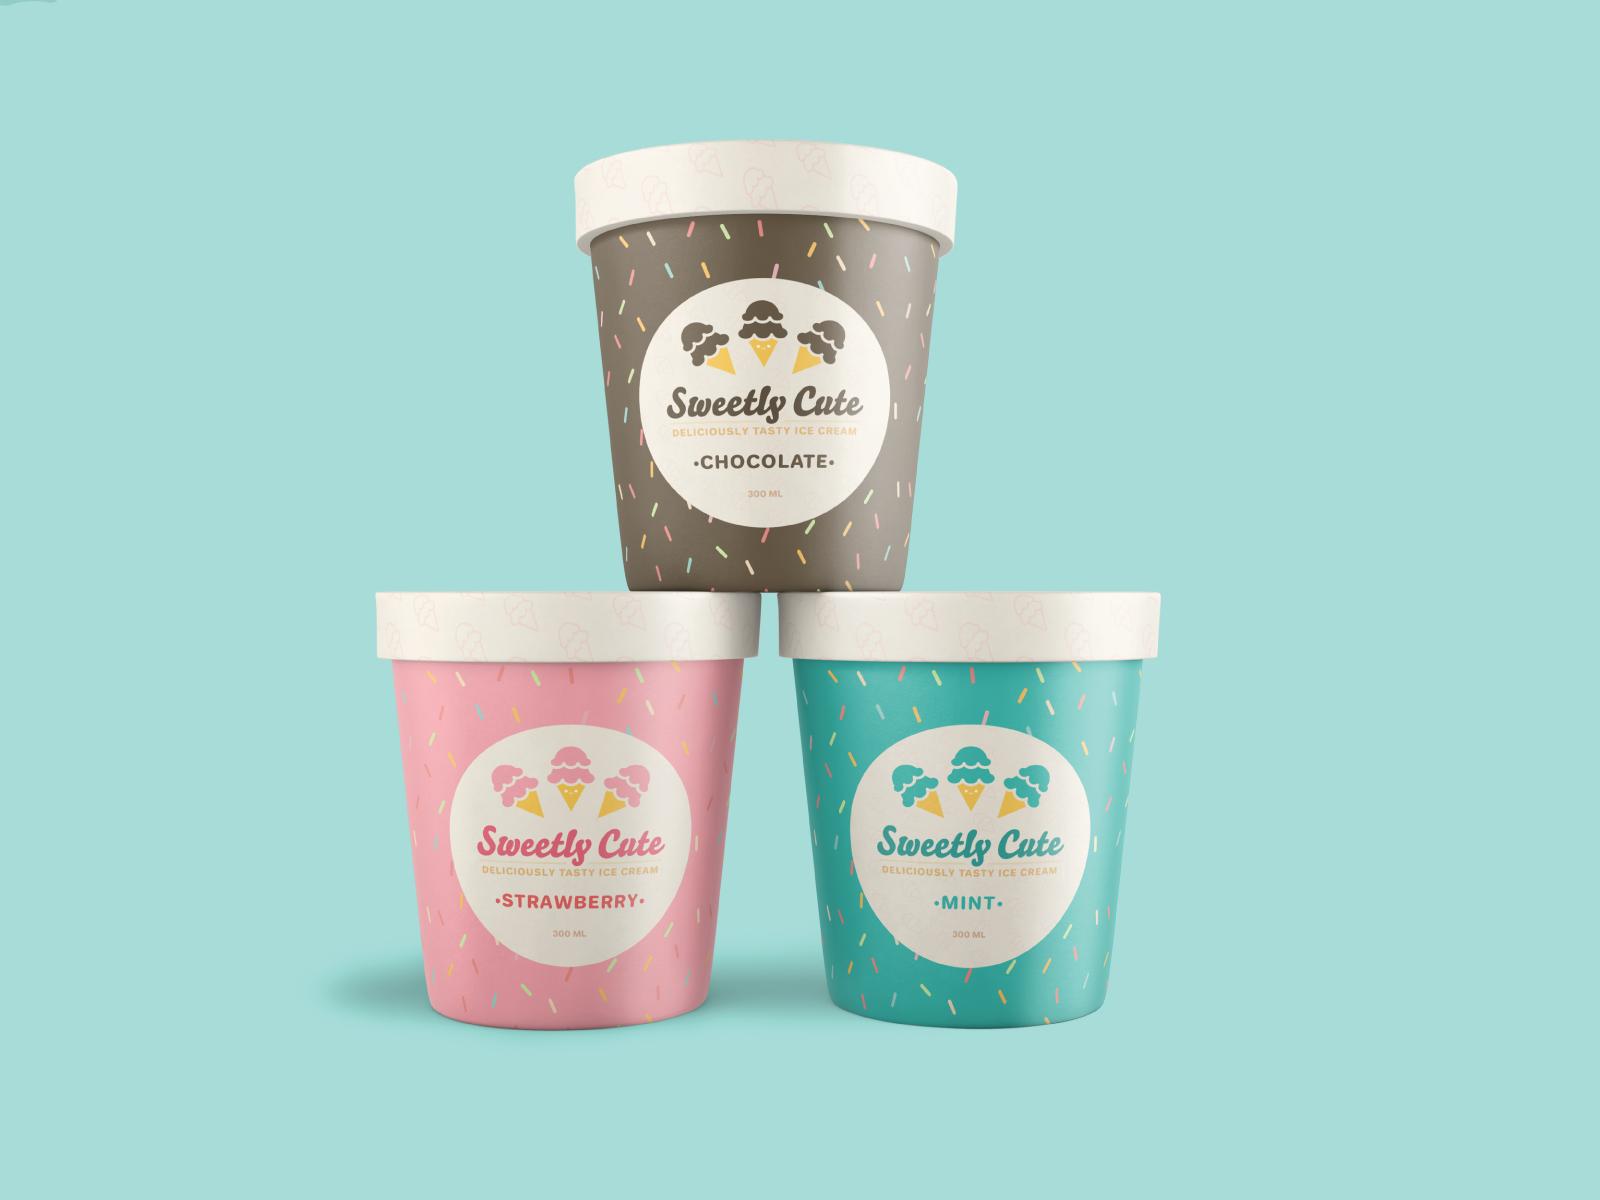 Sweetly Cute Ice Cream